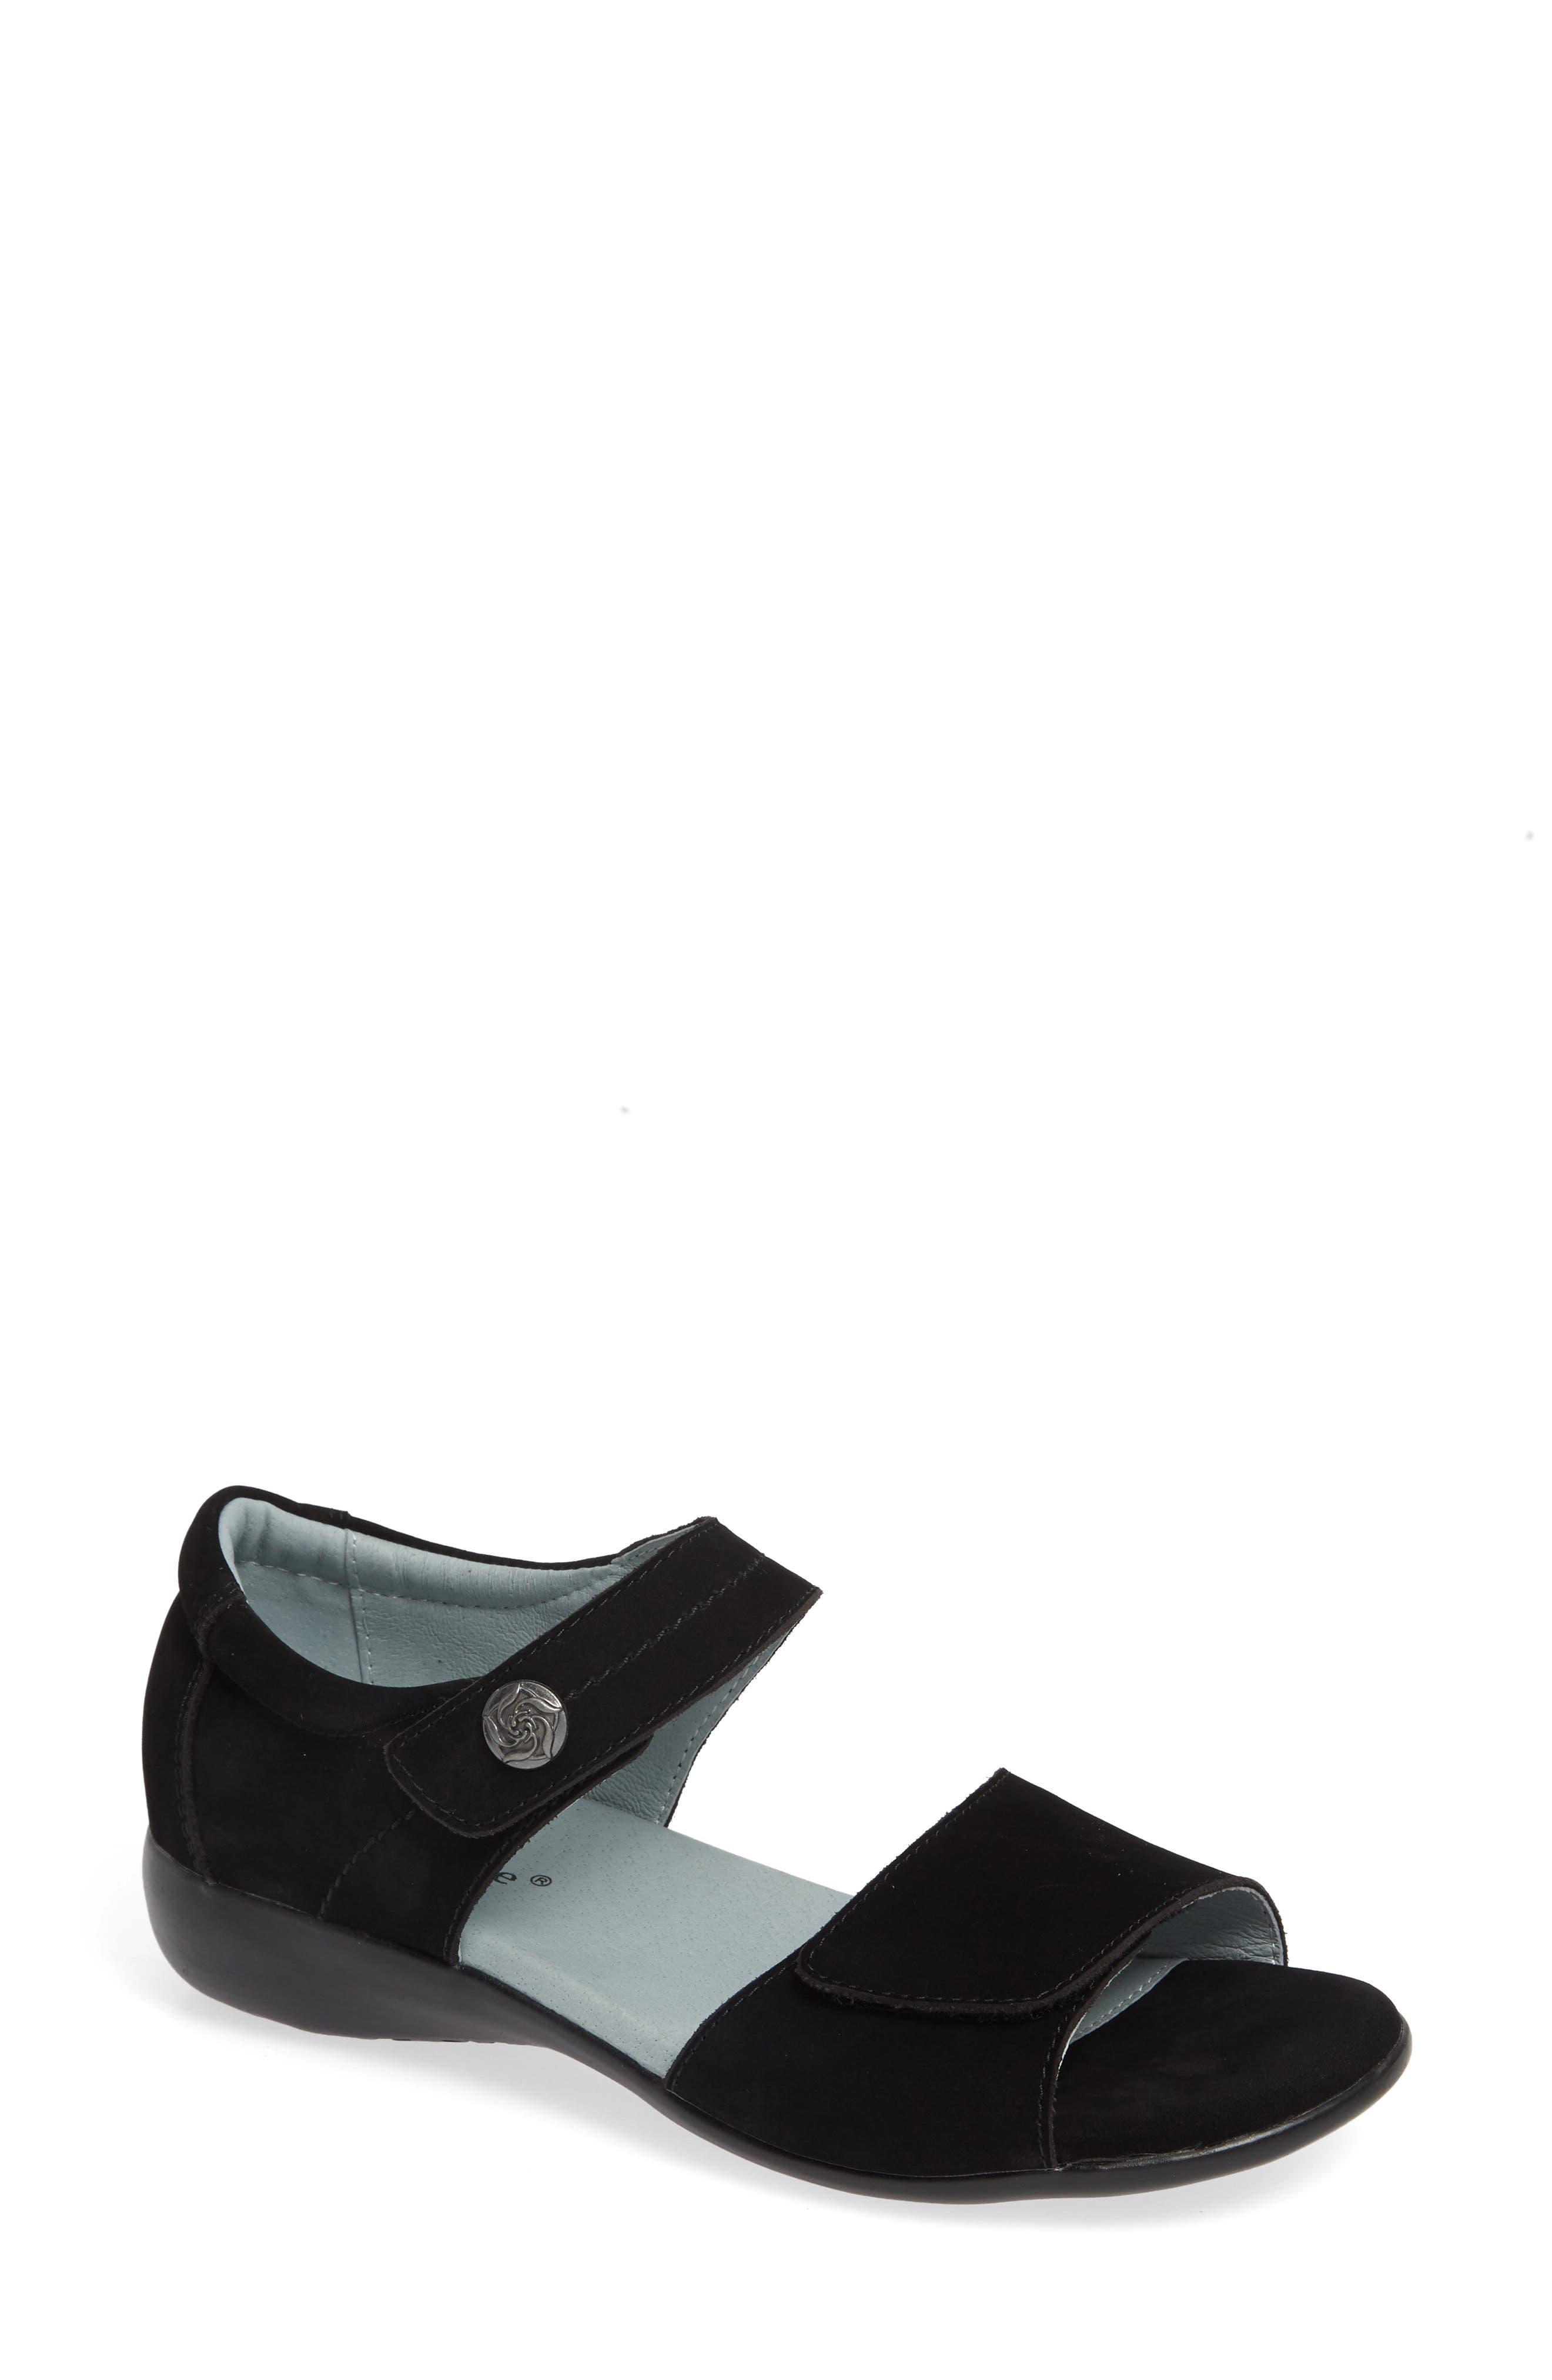 Superb Sandal, Main, color, BLACK NUBUCK LEATHER